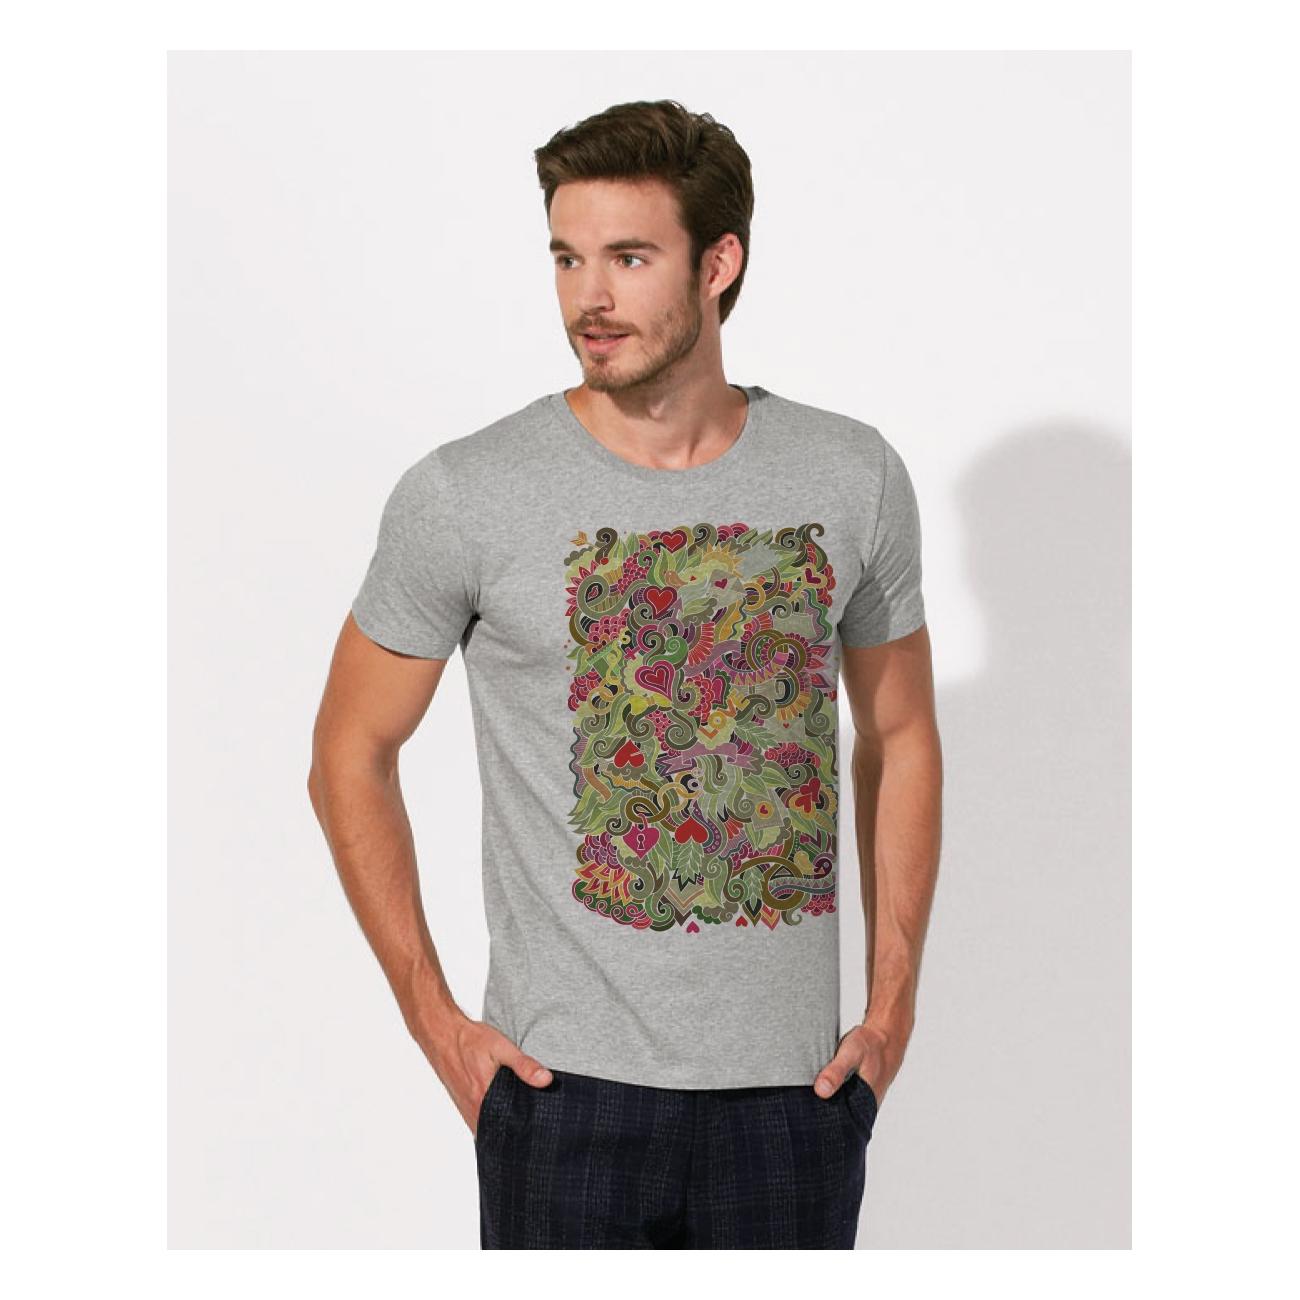 tee shirt coton bio col gris clair chin impression. Black Bedroom Furniture Sets. Home Design Ideas